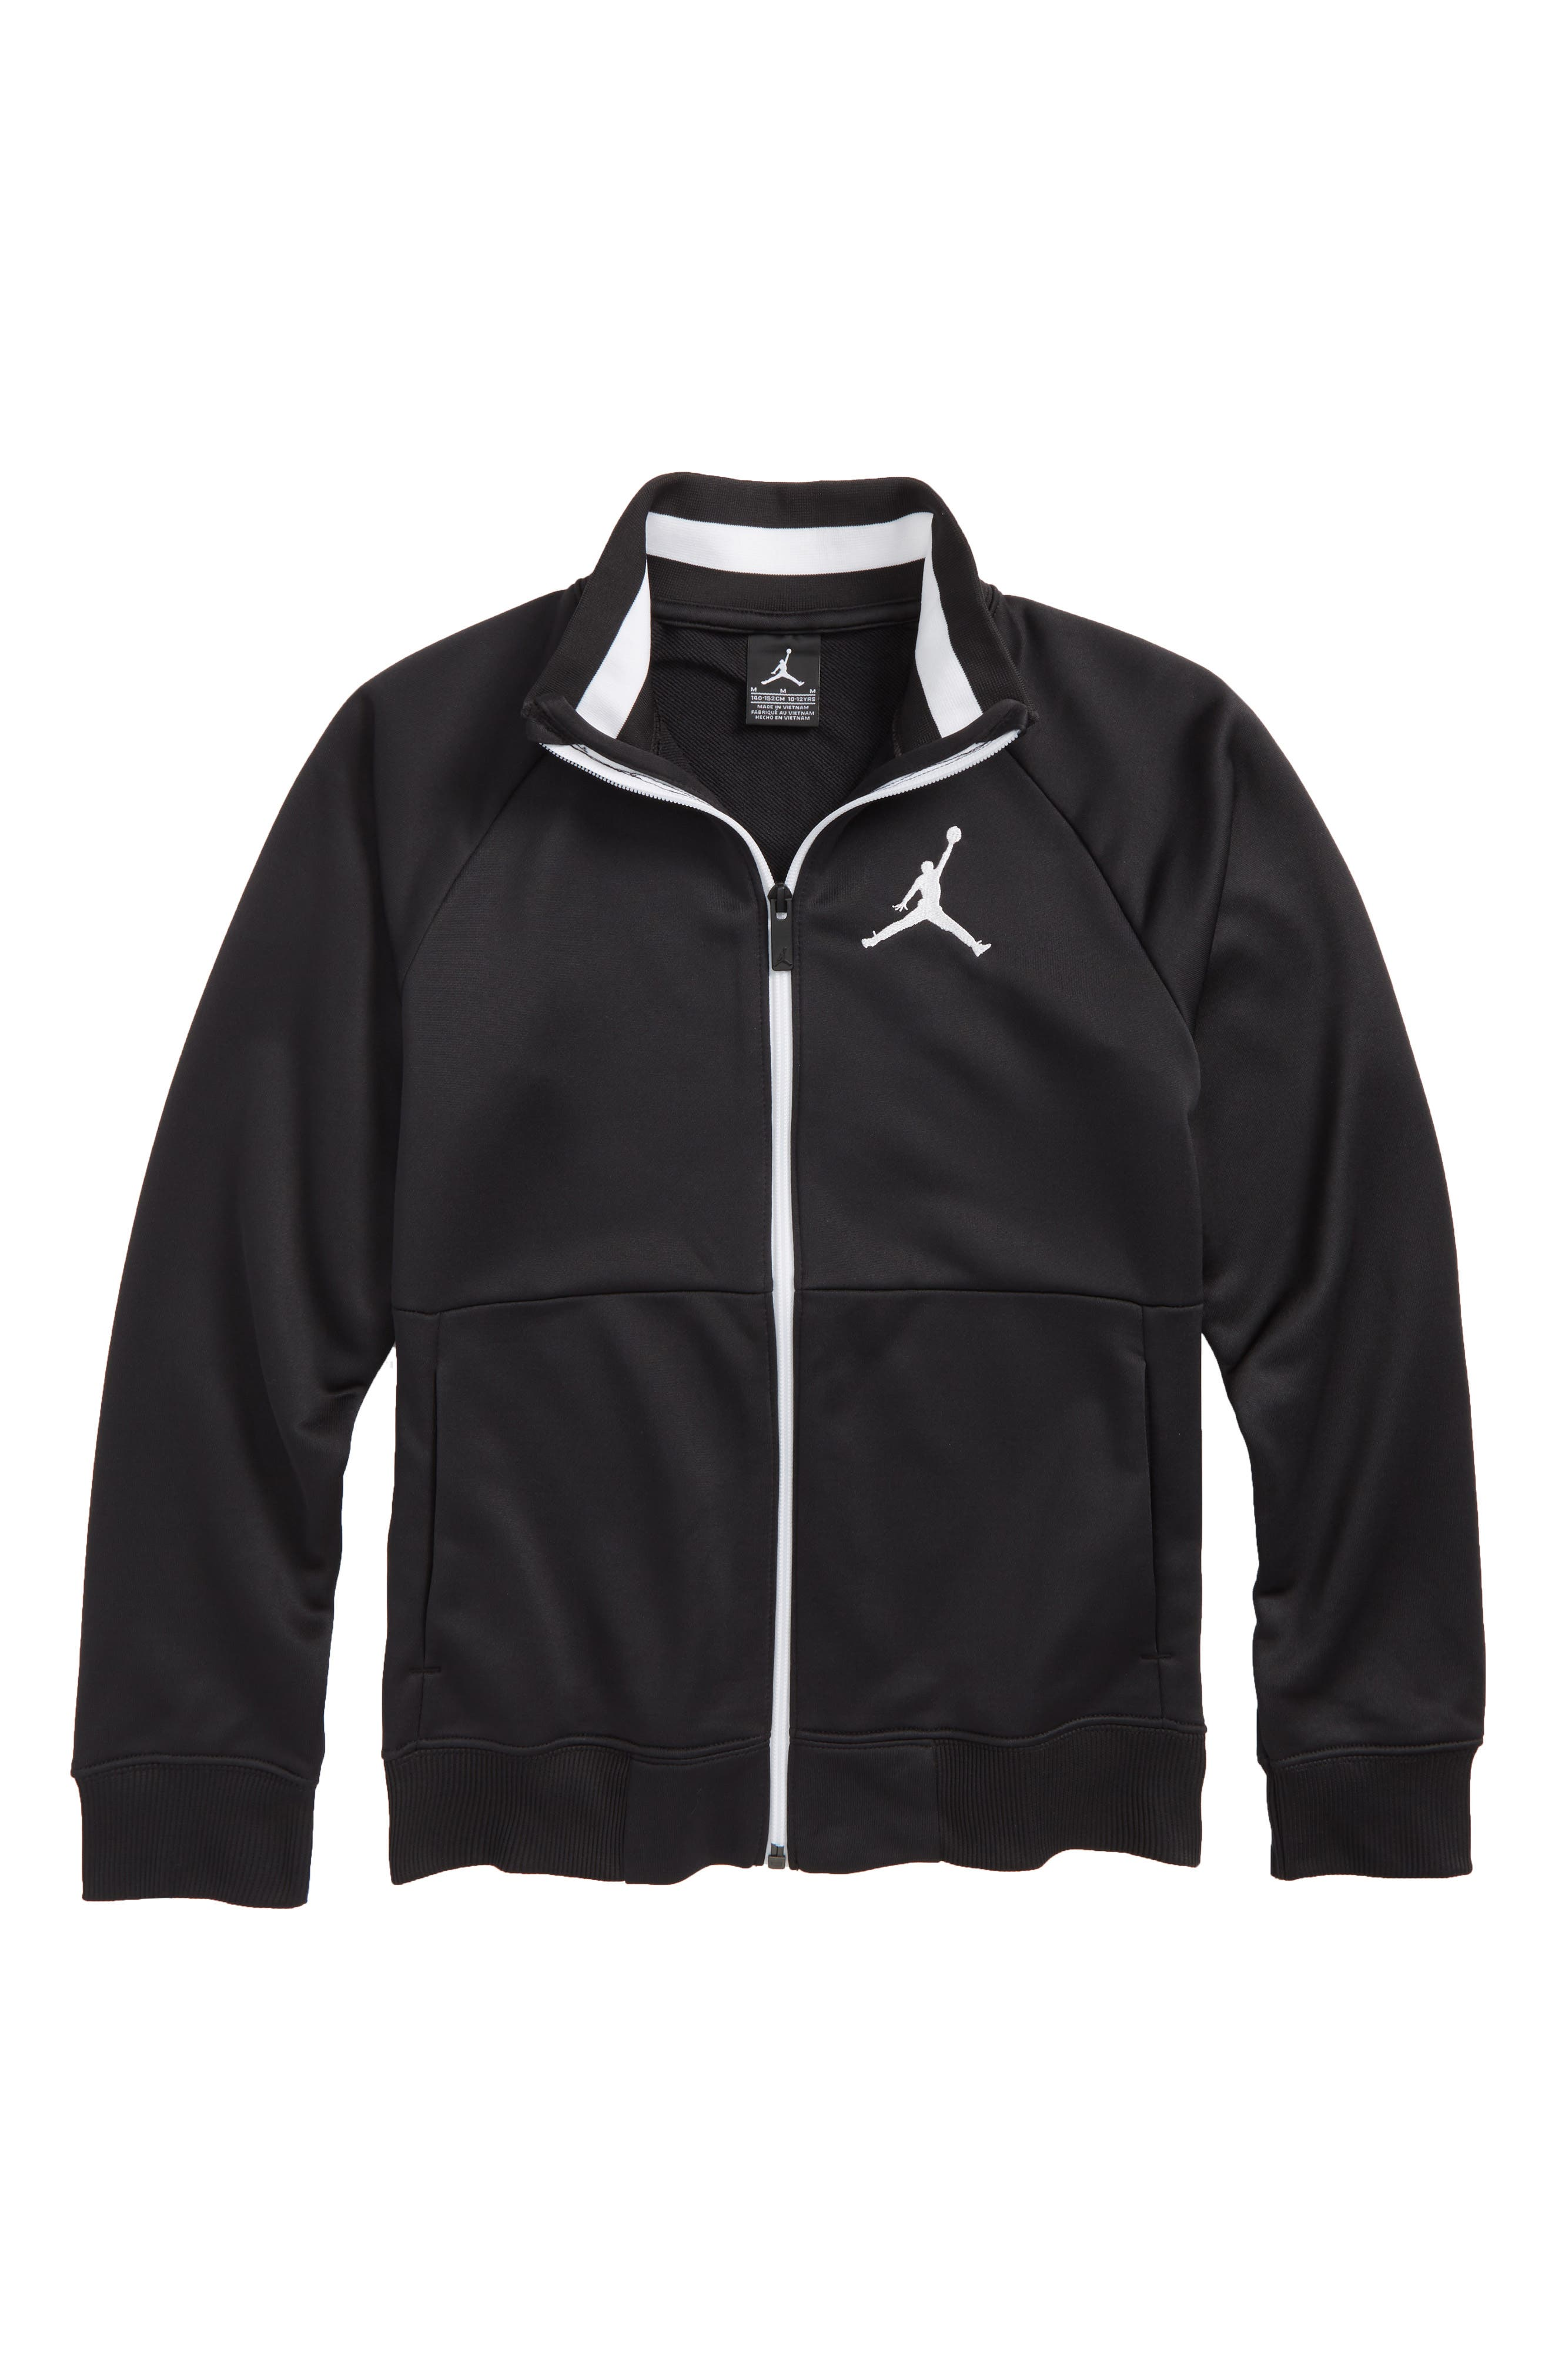 Jordan AJ 90s Tricot Jacket,                         Main,                         color, Black